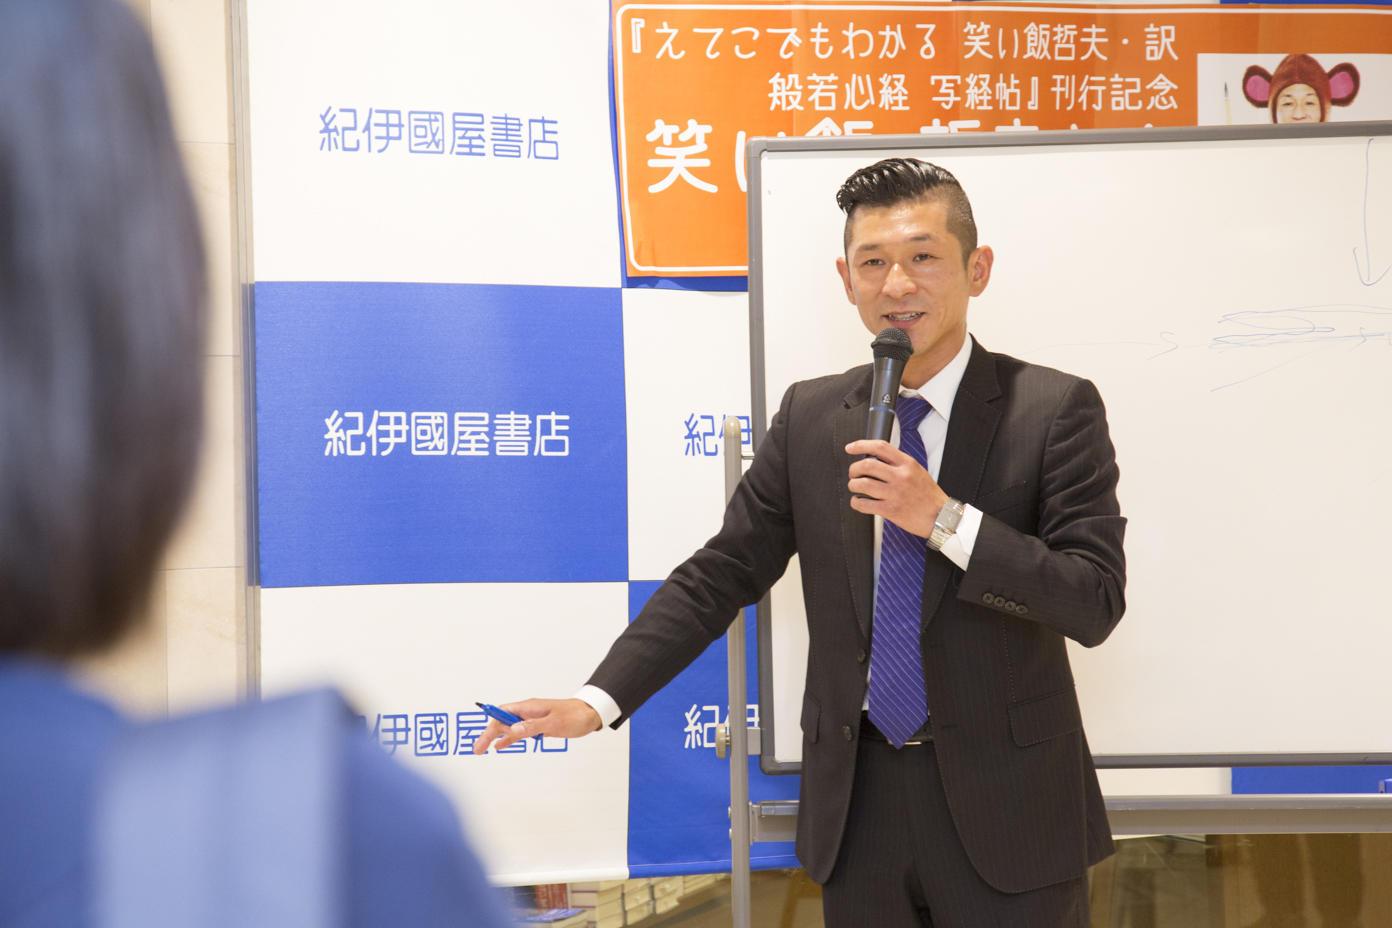 http://news.yoshimoto.co.jp/20170531222654-a8003f066f5c90f3fccfd8b8b0f50d8dea91f021.jpg